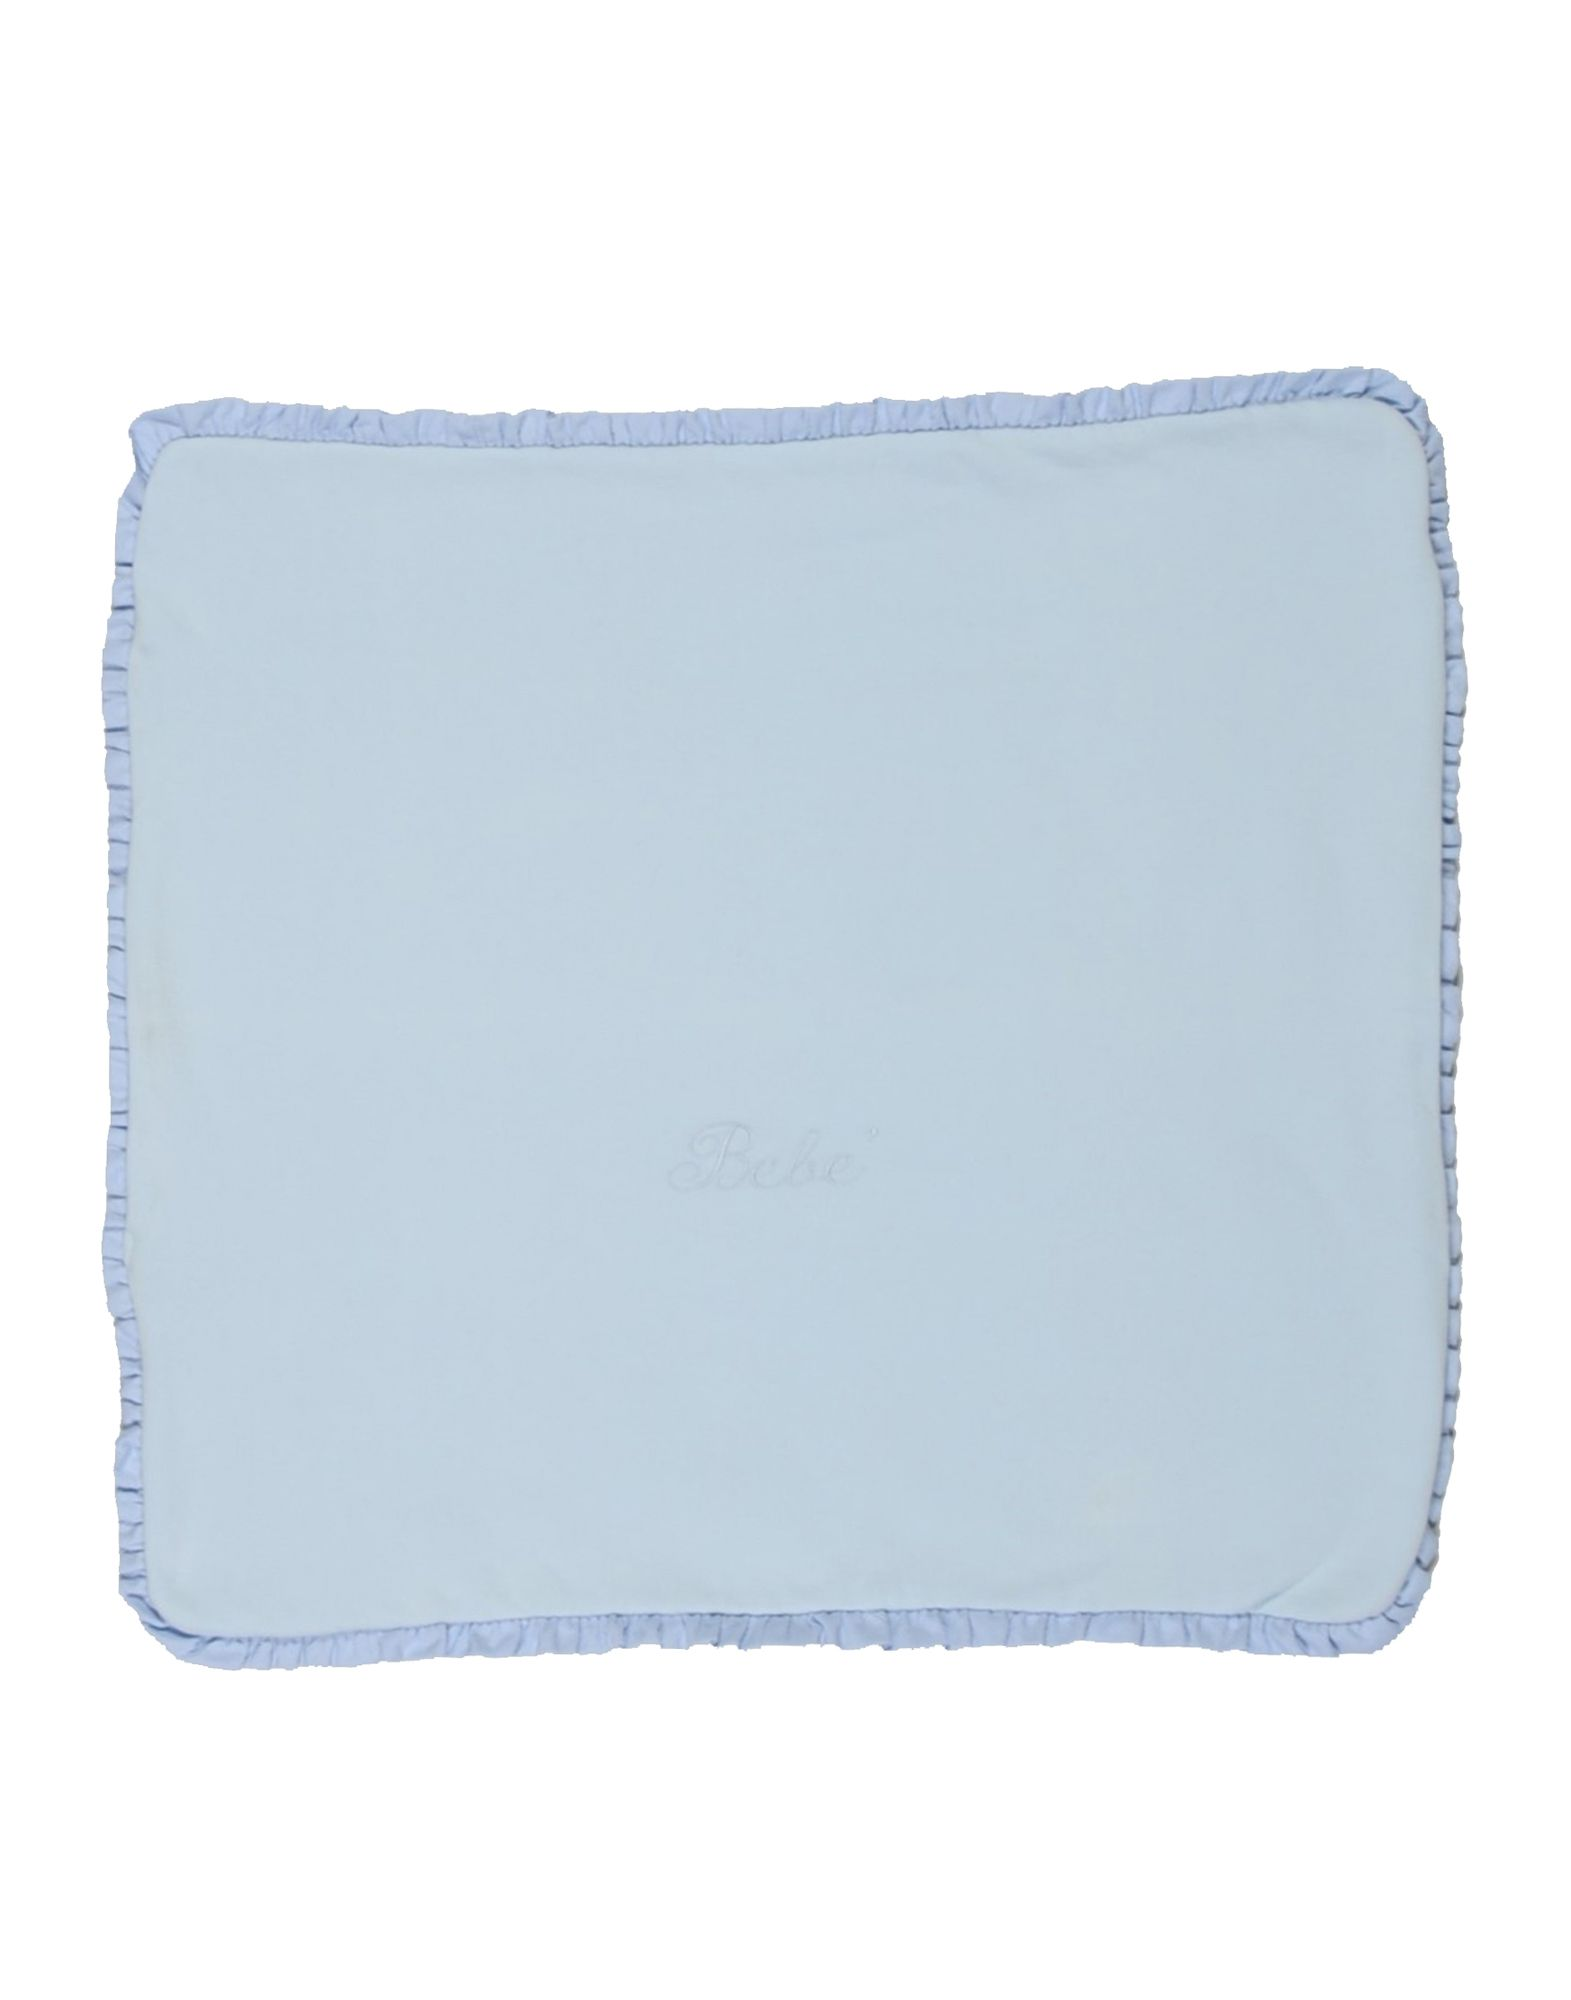 MARINA DAL SANTO Одеяльце для младенцев dal dosso u80 np touch cohiba